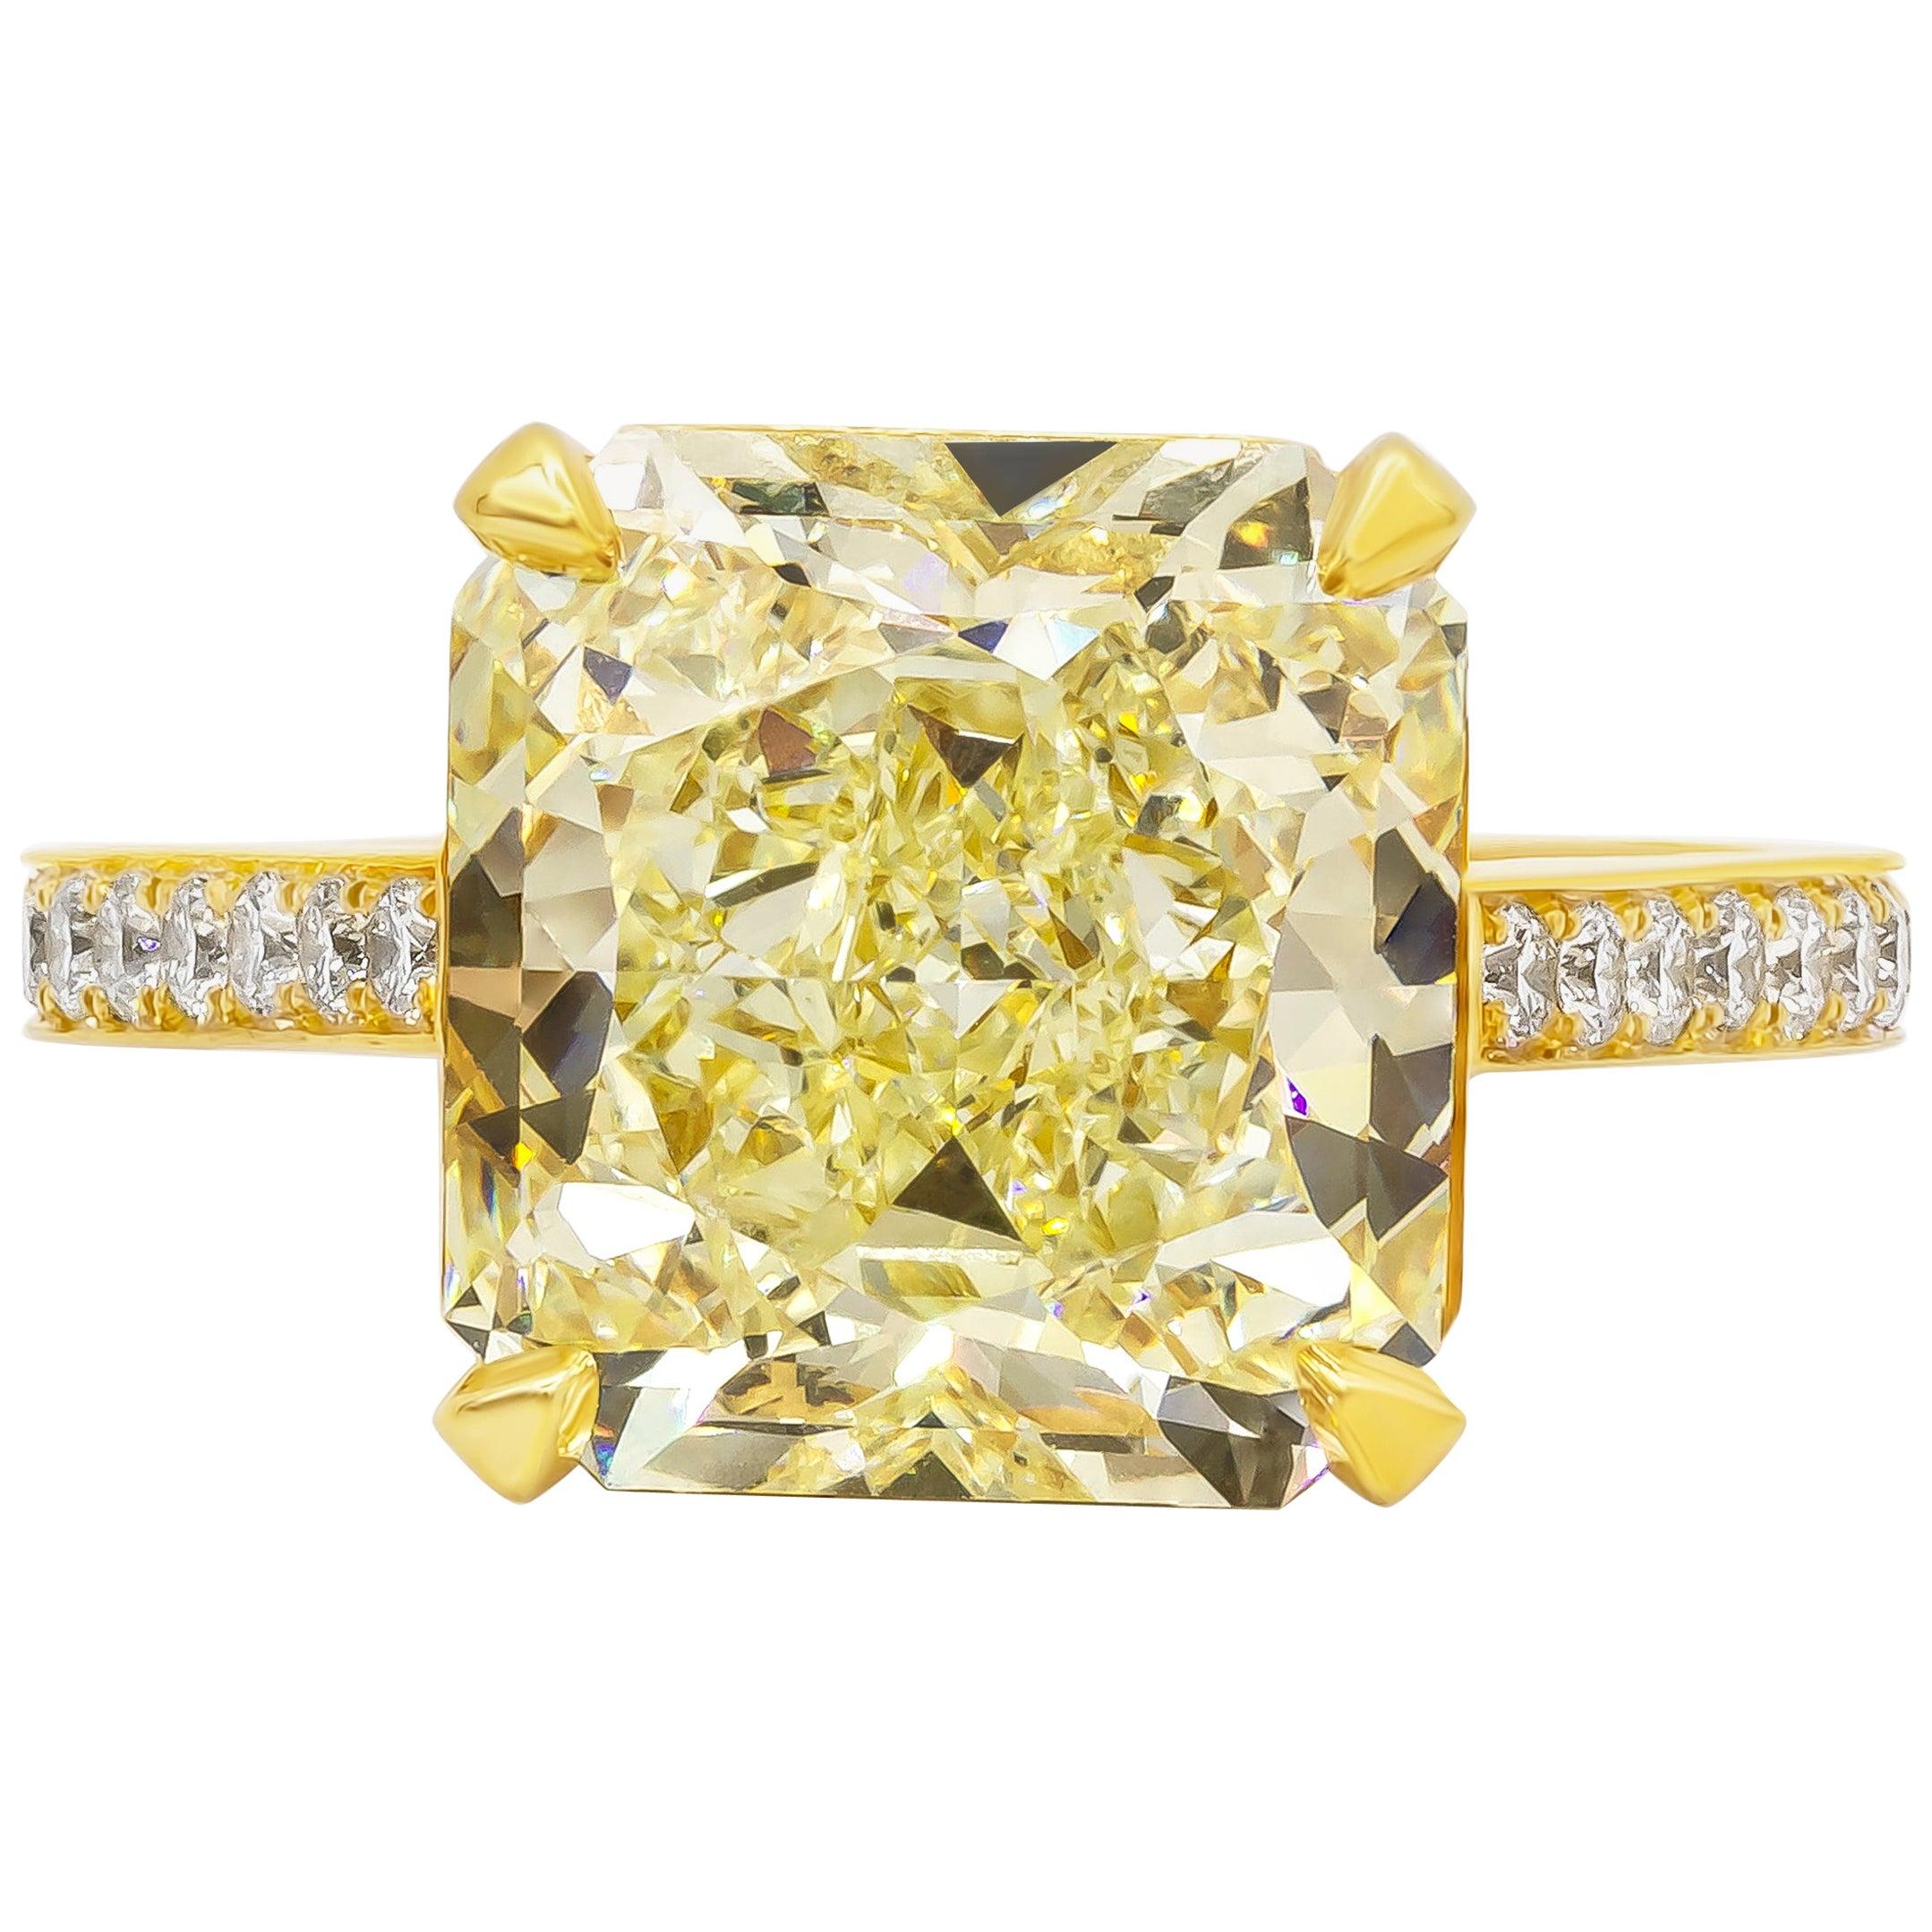 GIA Certified 8.07 Carat Radiant Cut Yellow Diamond Engagement Ring